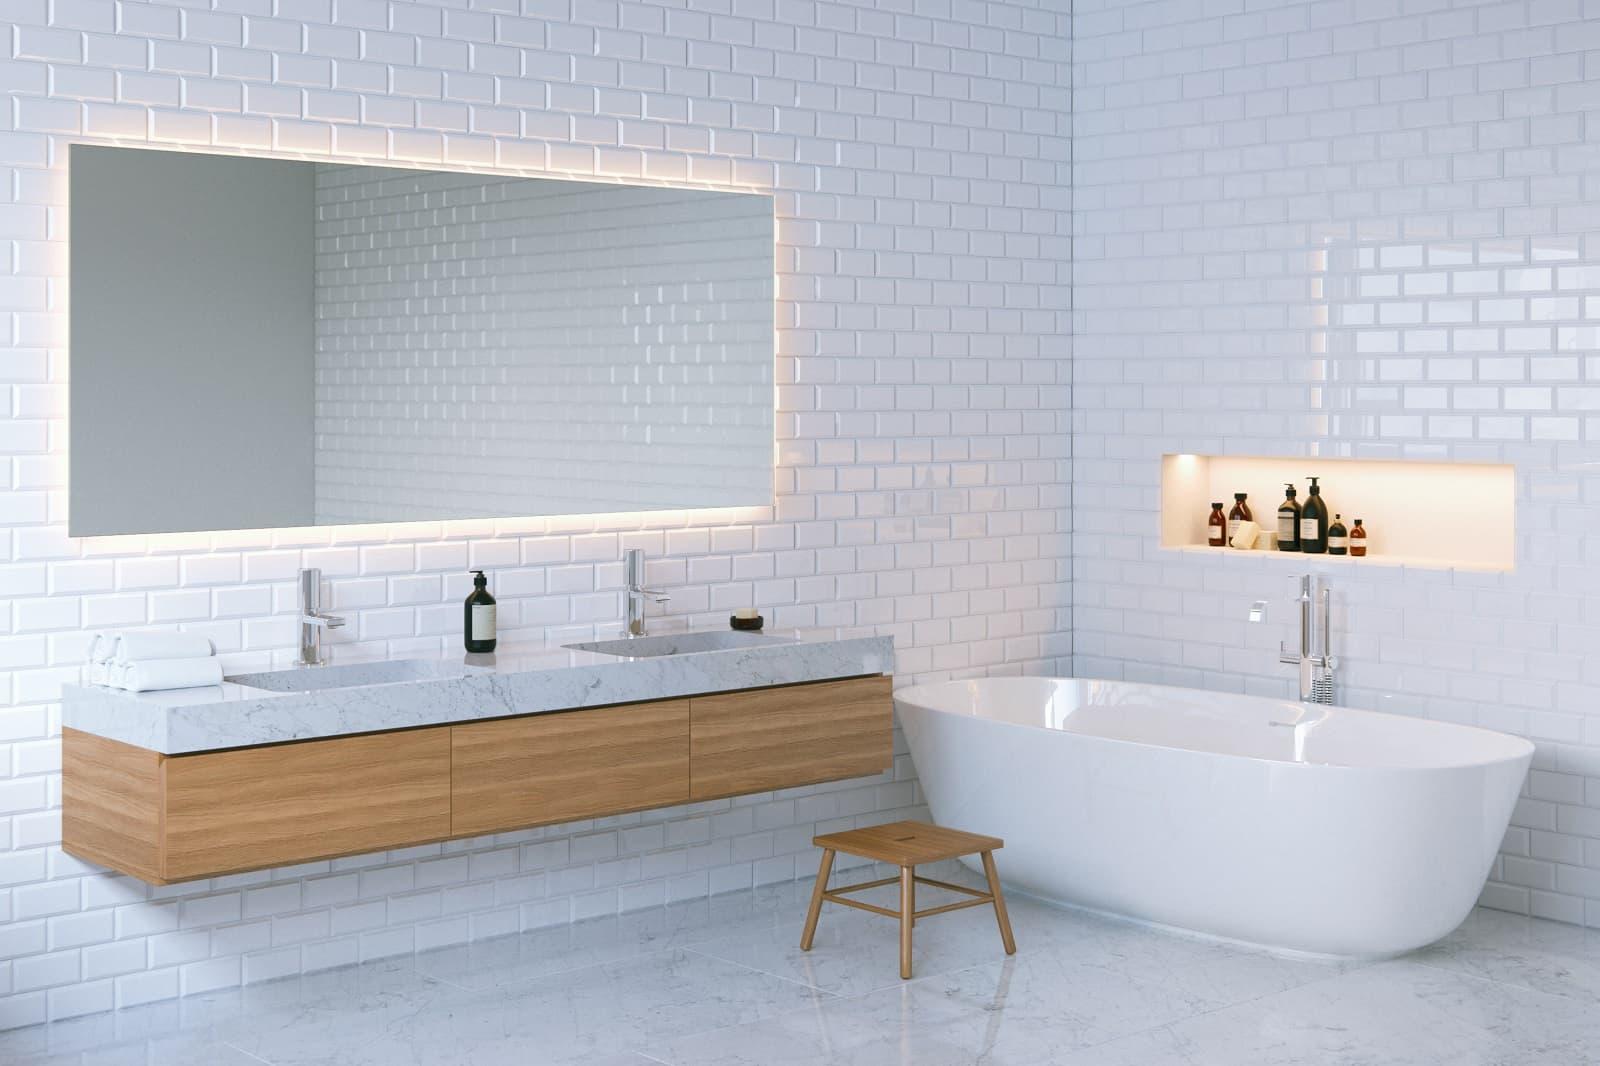 Get Your Dream Bathroom #25 in Newcastle Bathroom Renovations